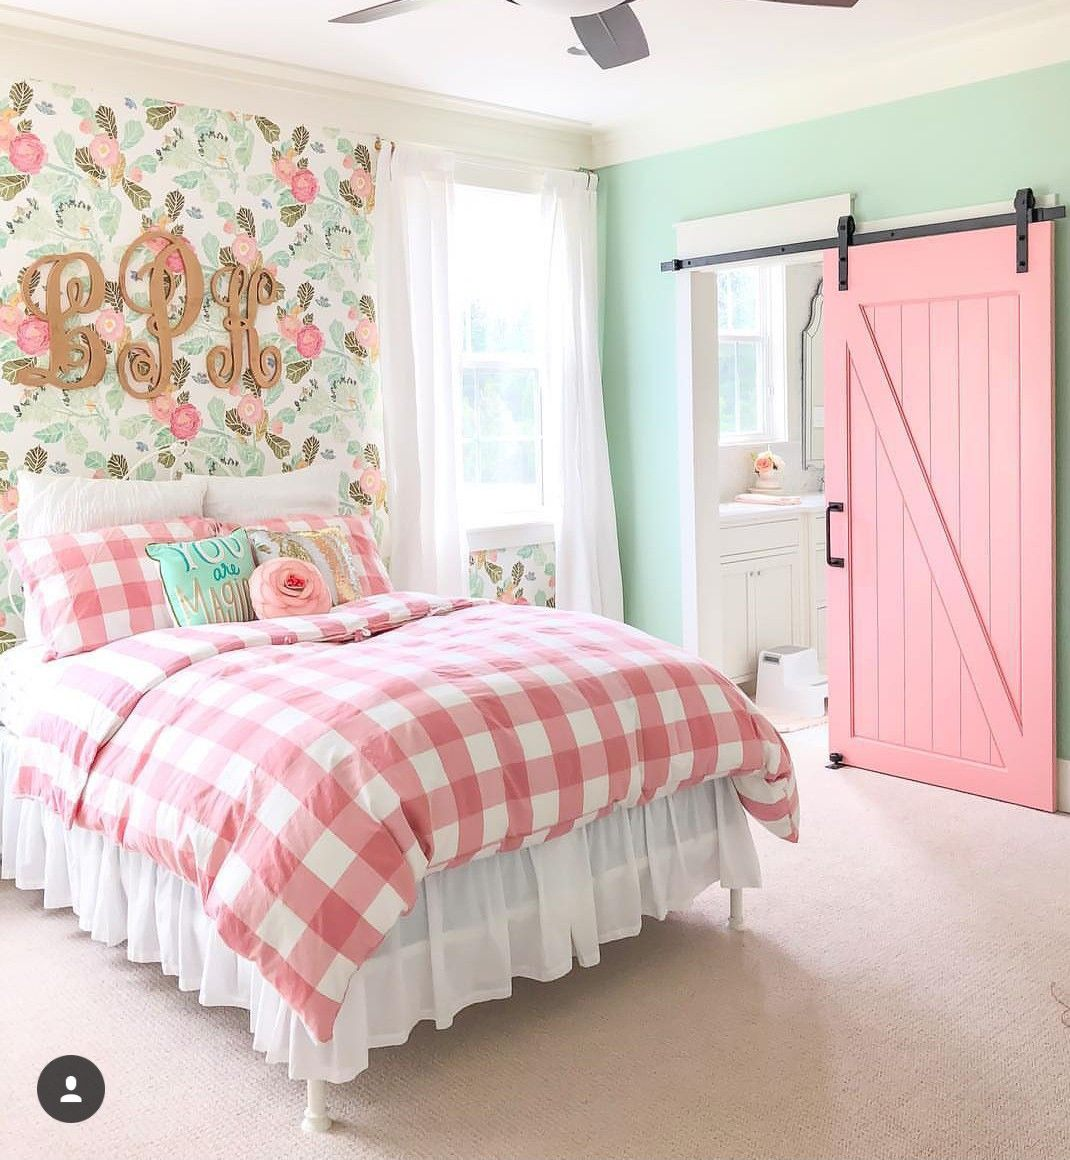 Pink And Robins Egg Blue Tween Girl Bedroom Big Girl Bedrooms Little Girl Rooms